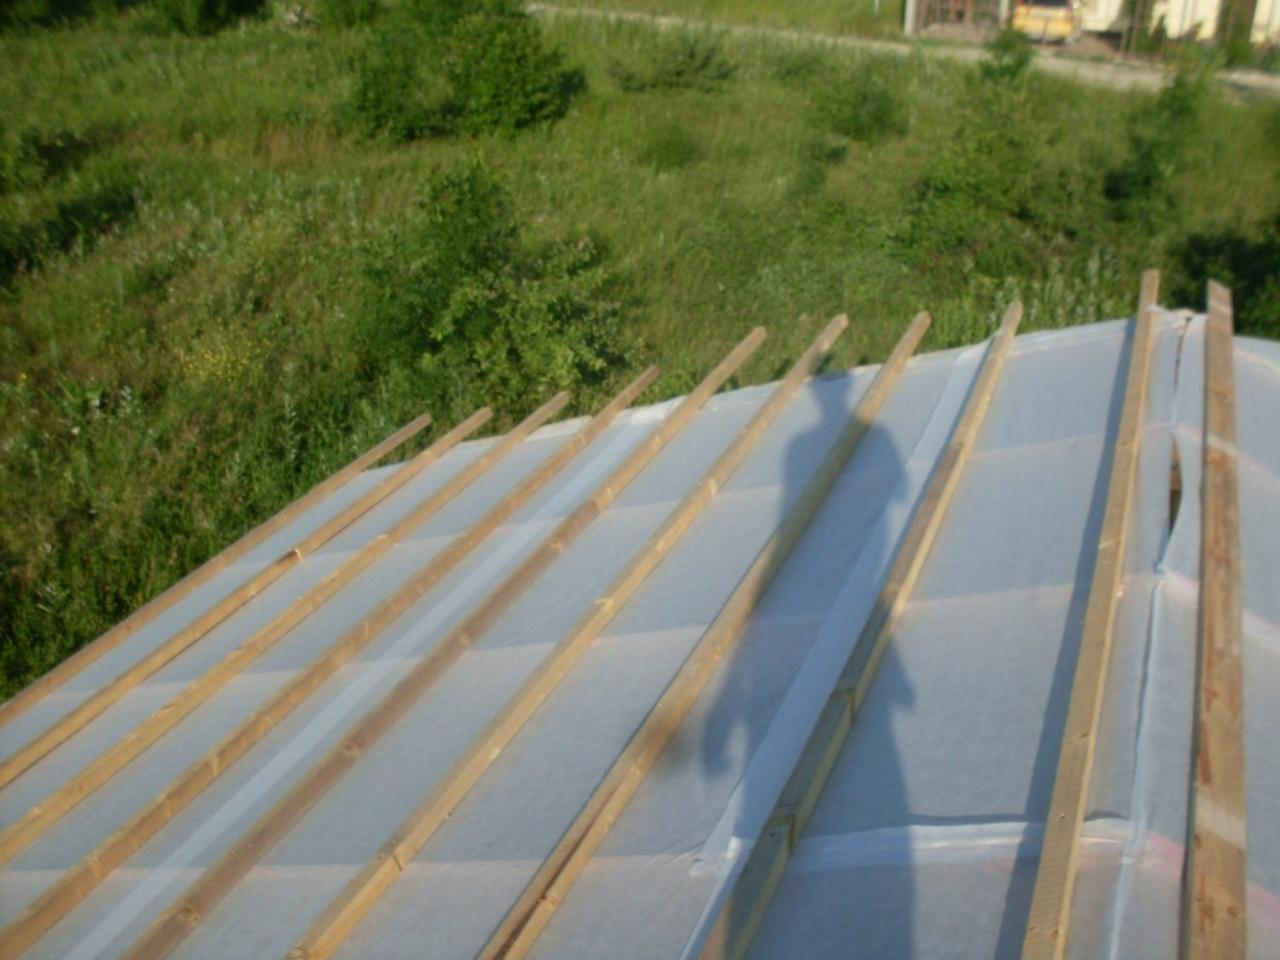 обрешетка крыши и пленка (мембрана)